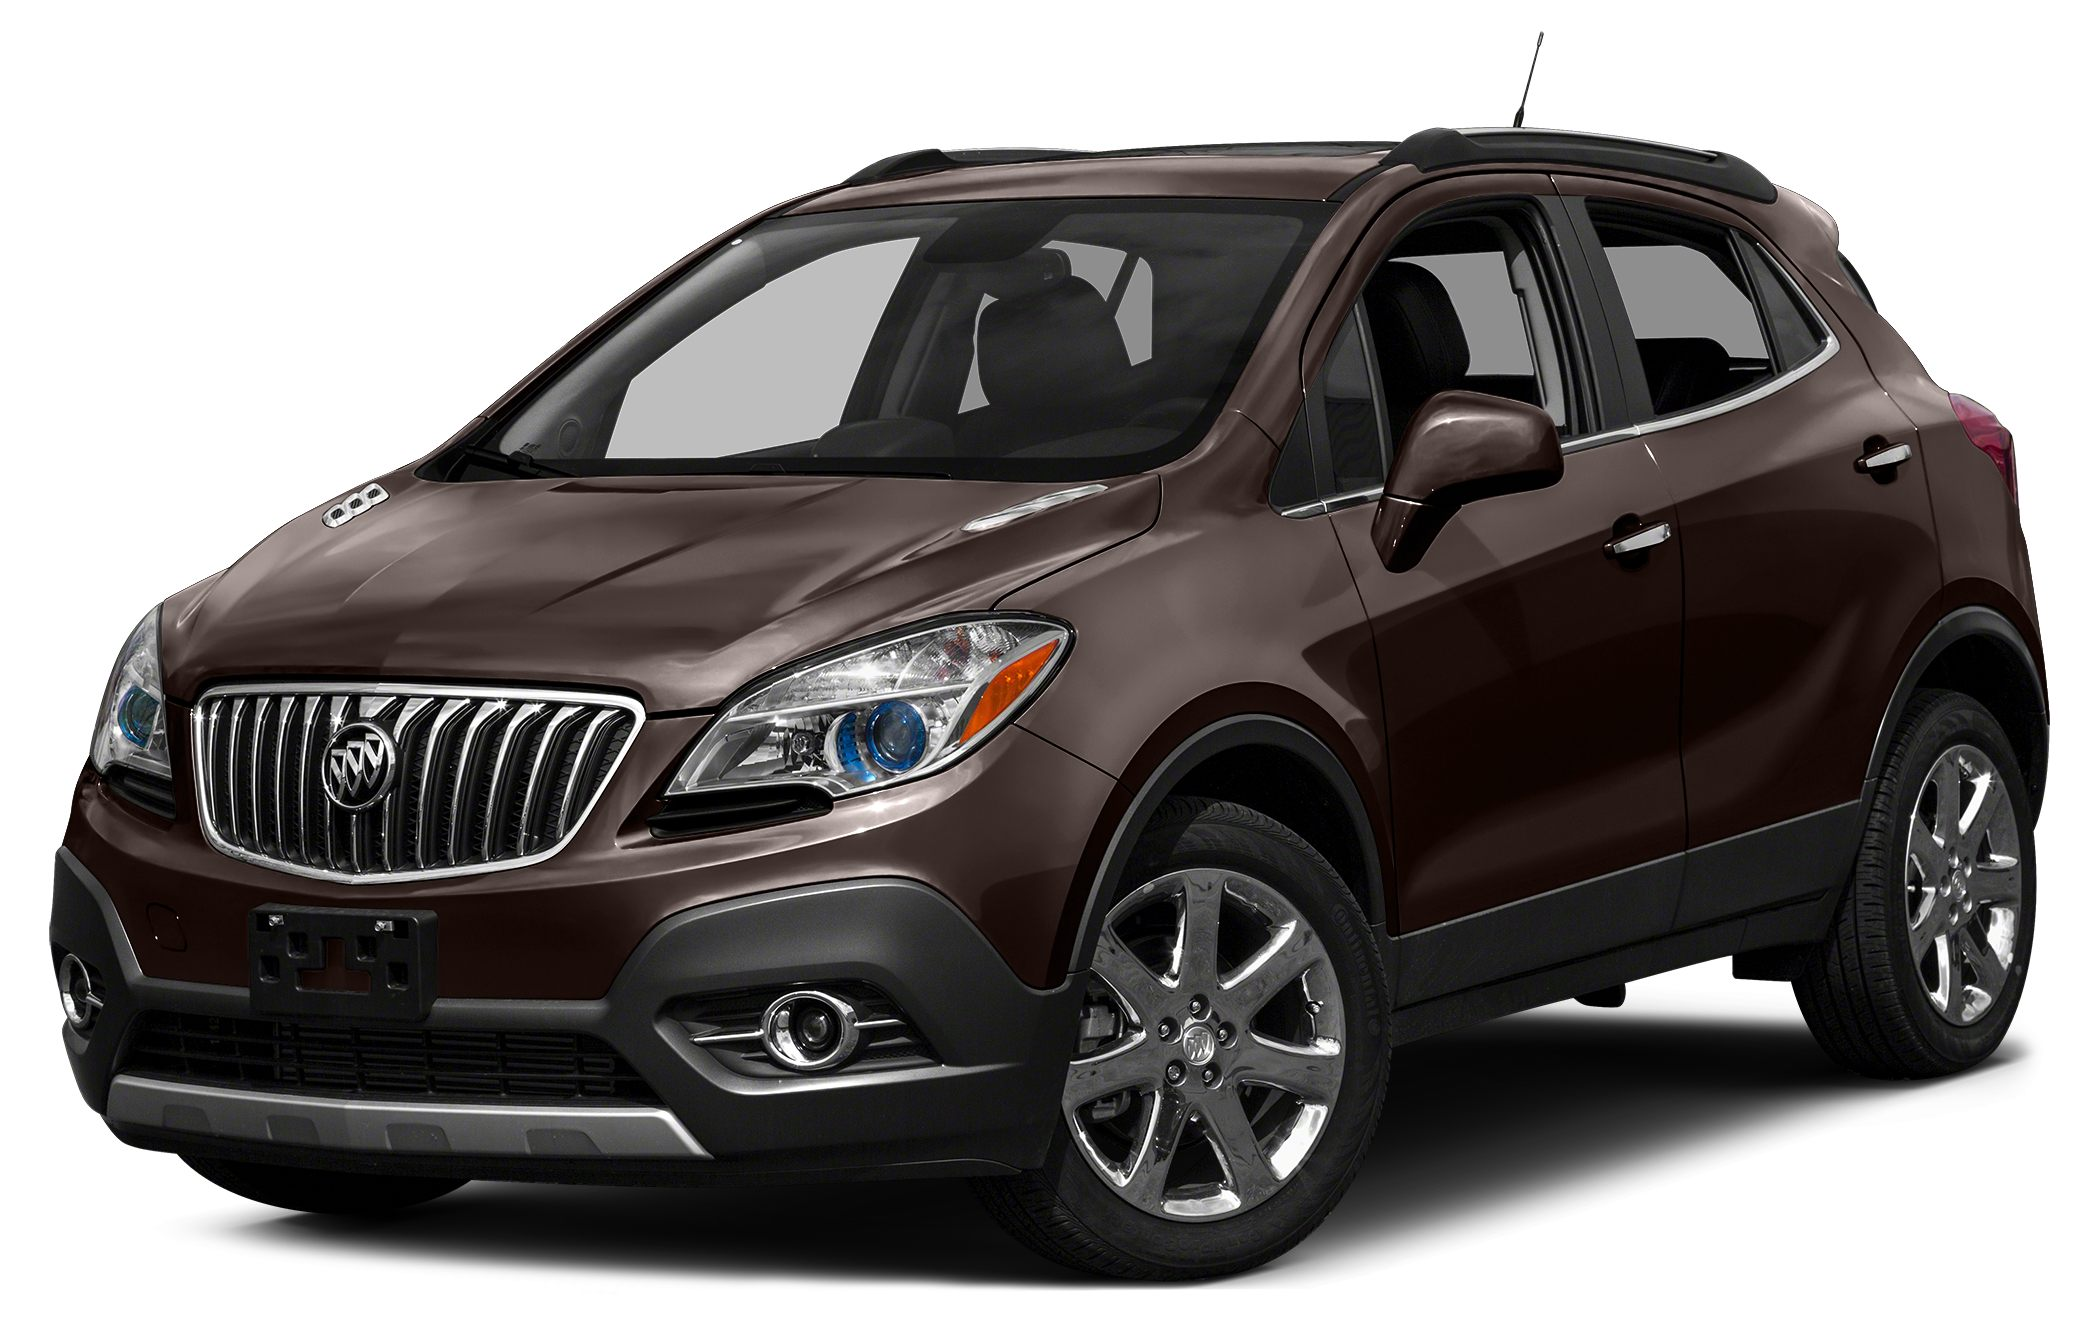 2014 Buick Encore Premium Miles 11986Color Brown Stock 3100 VIN KL4CJDSB4EB700576